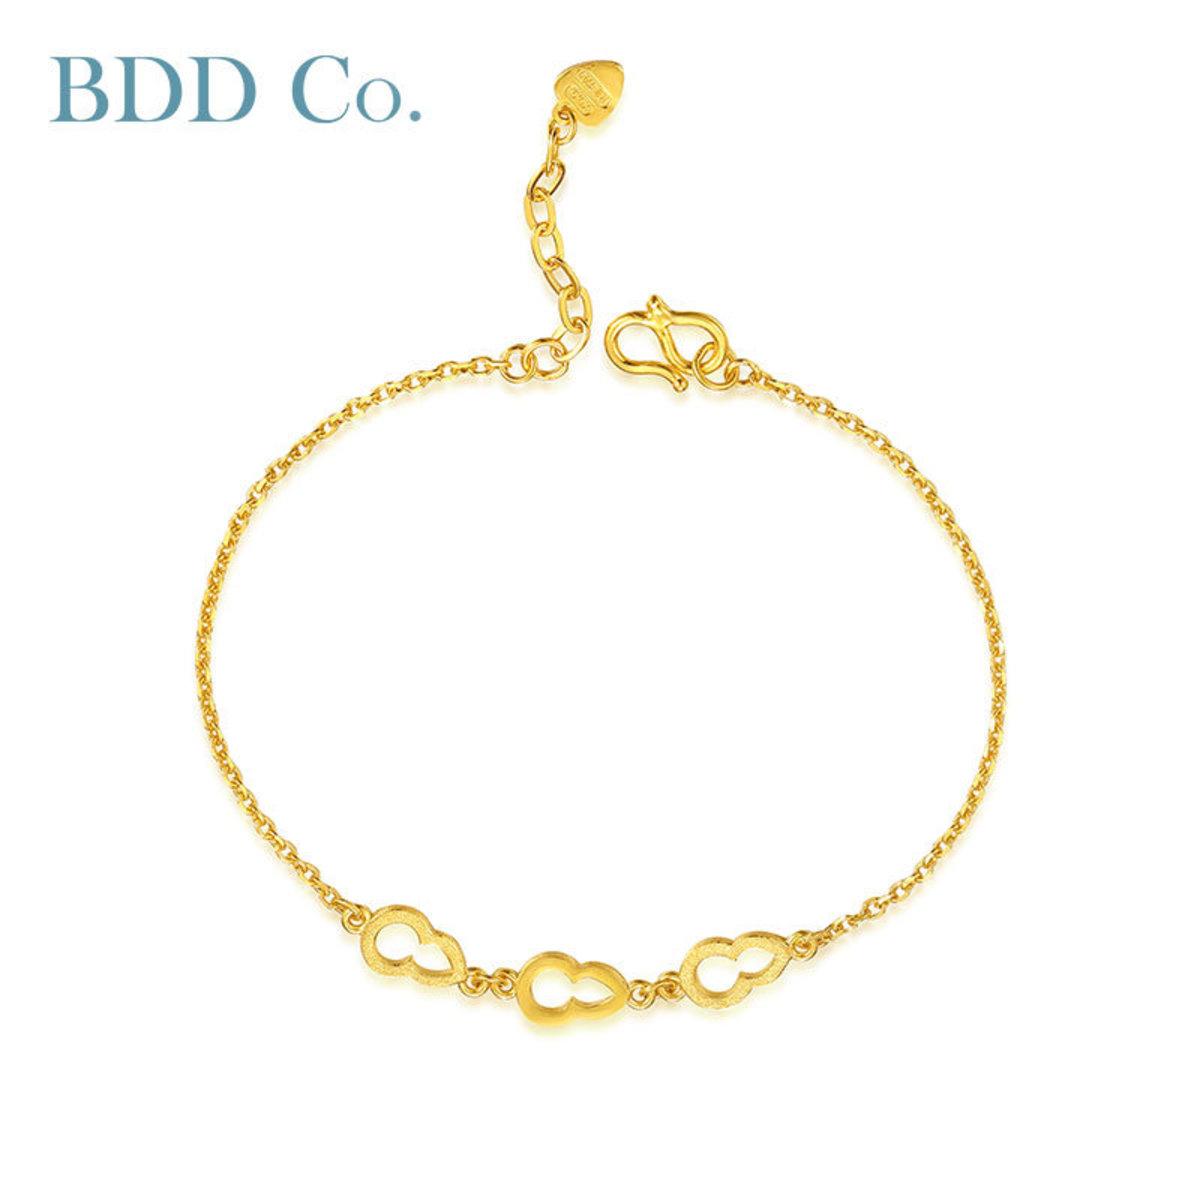 【BDD-Co.】黃金手鏈 足金金葫蘆手鏈18cm